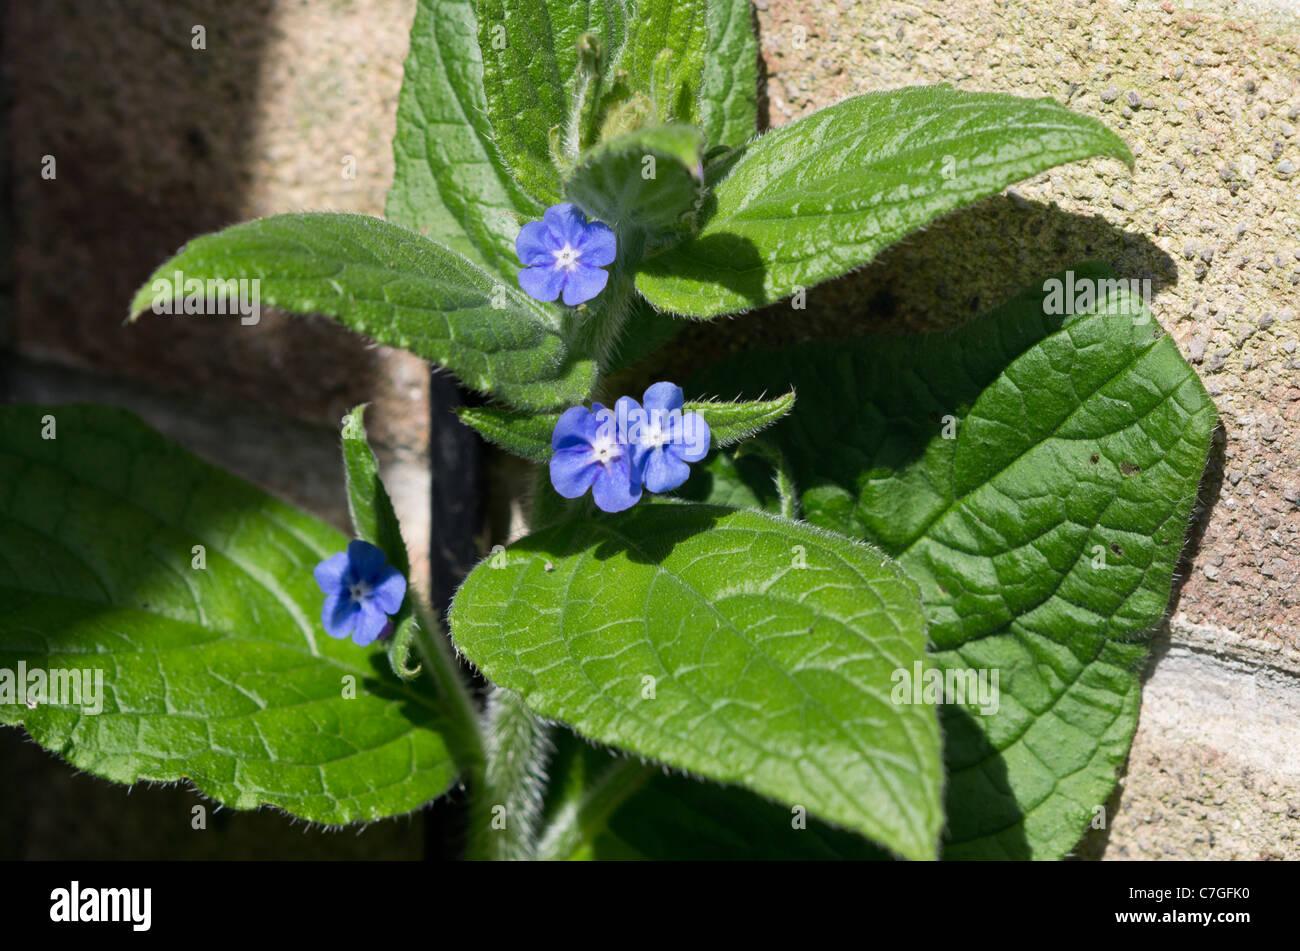 Pentaglottis sempervirens green alkanet, evergreen bugloss or alkanet - Stock Image